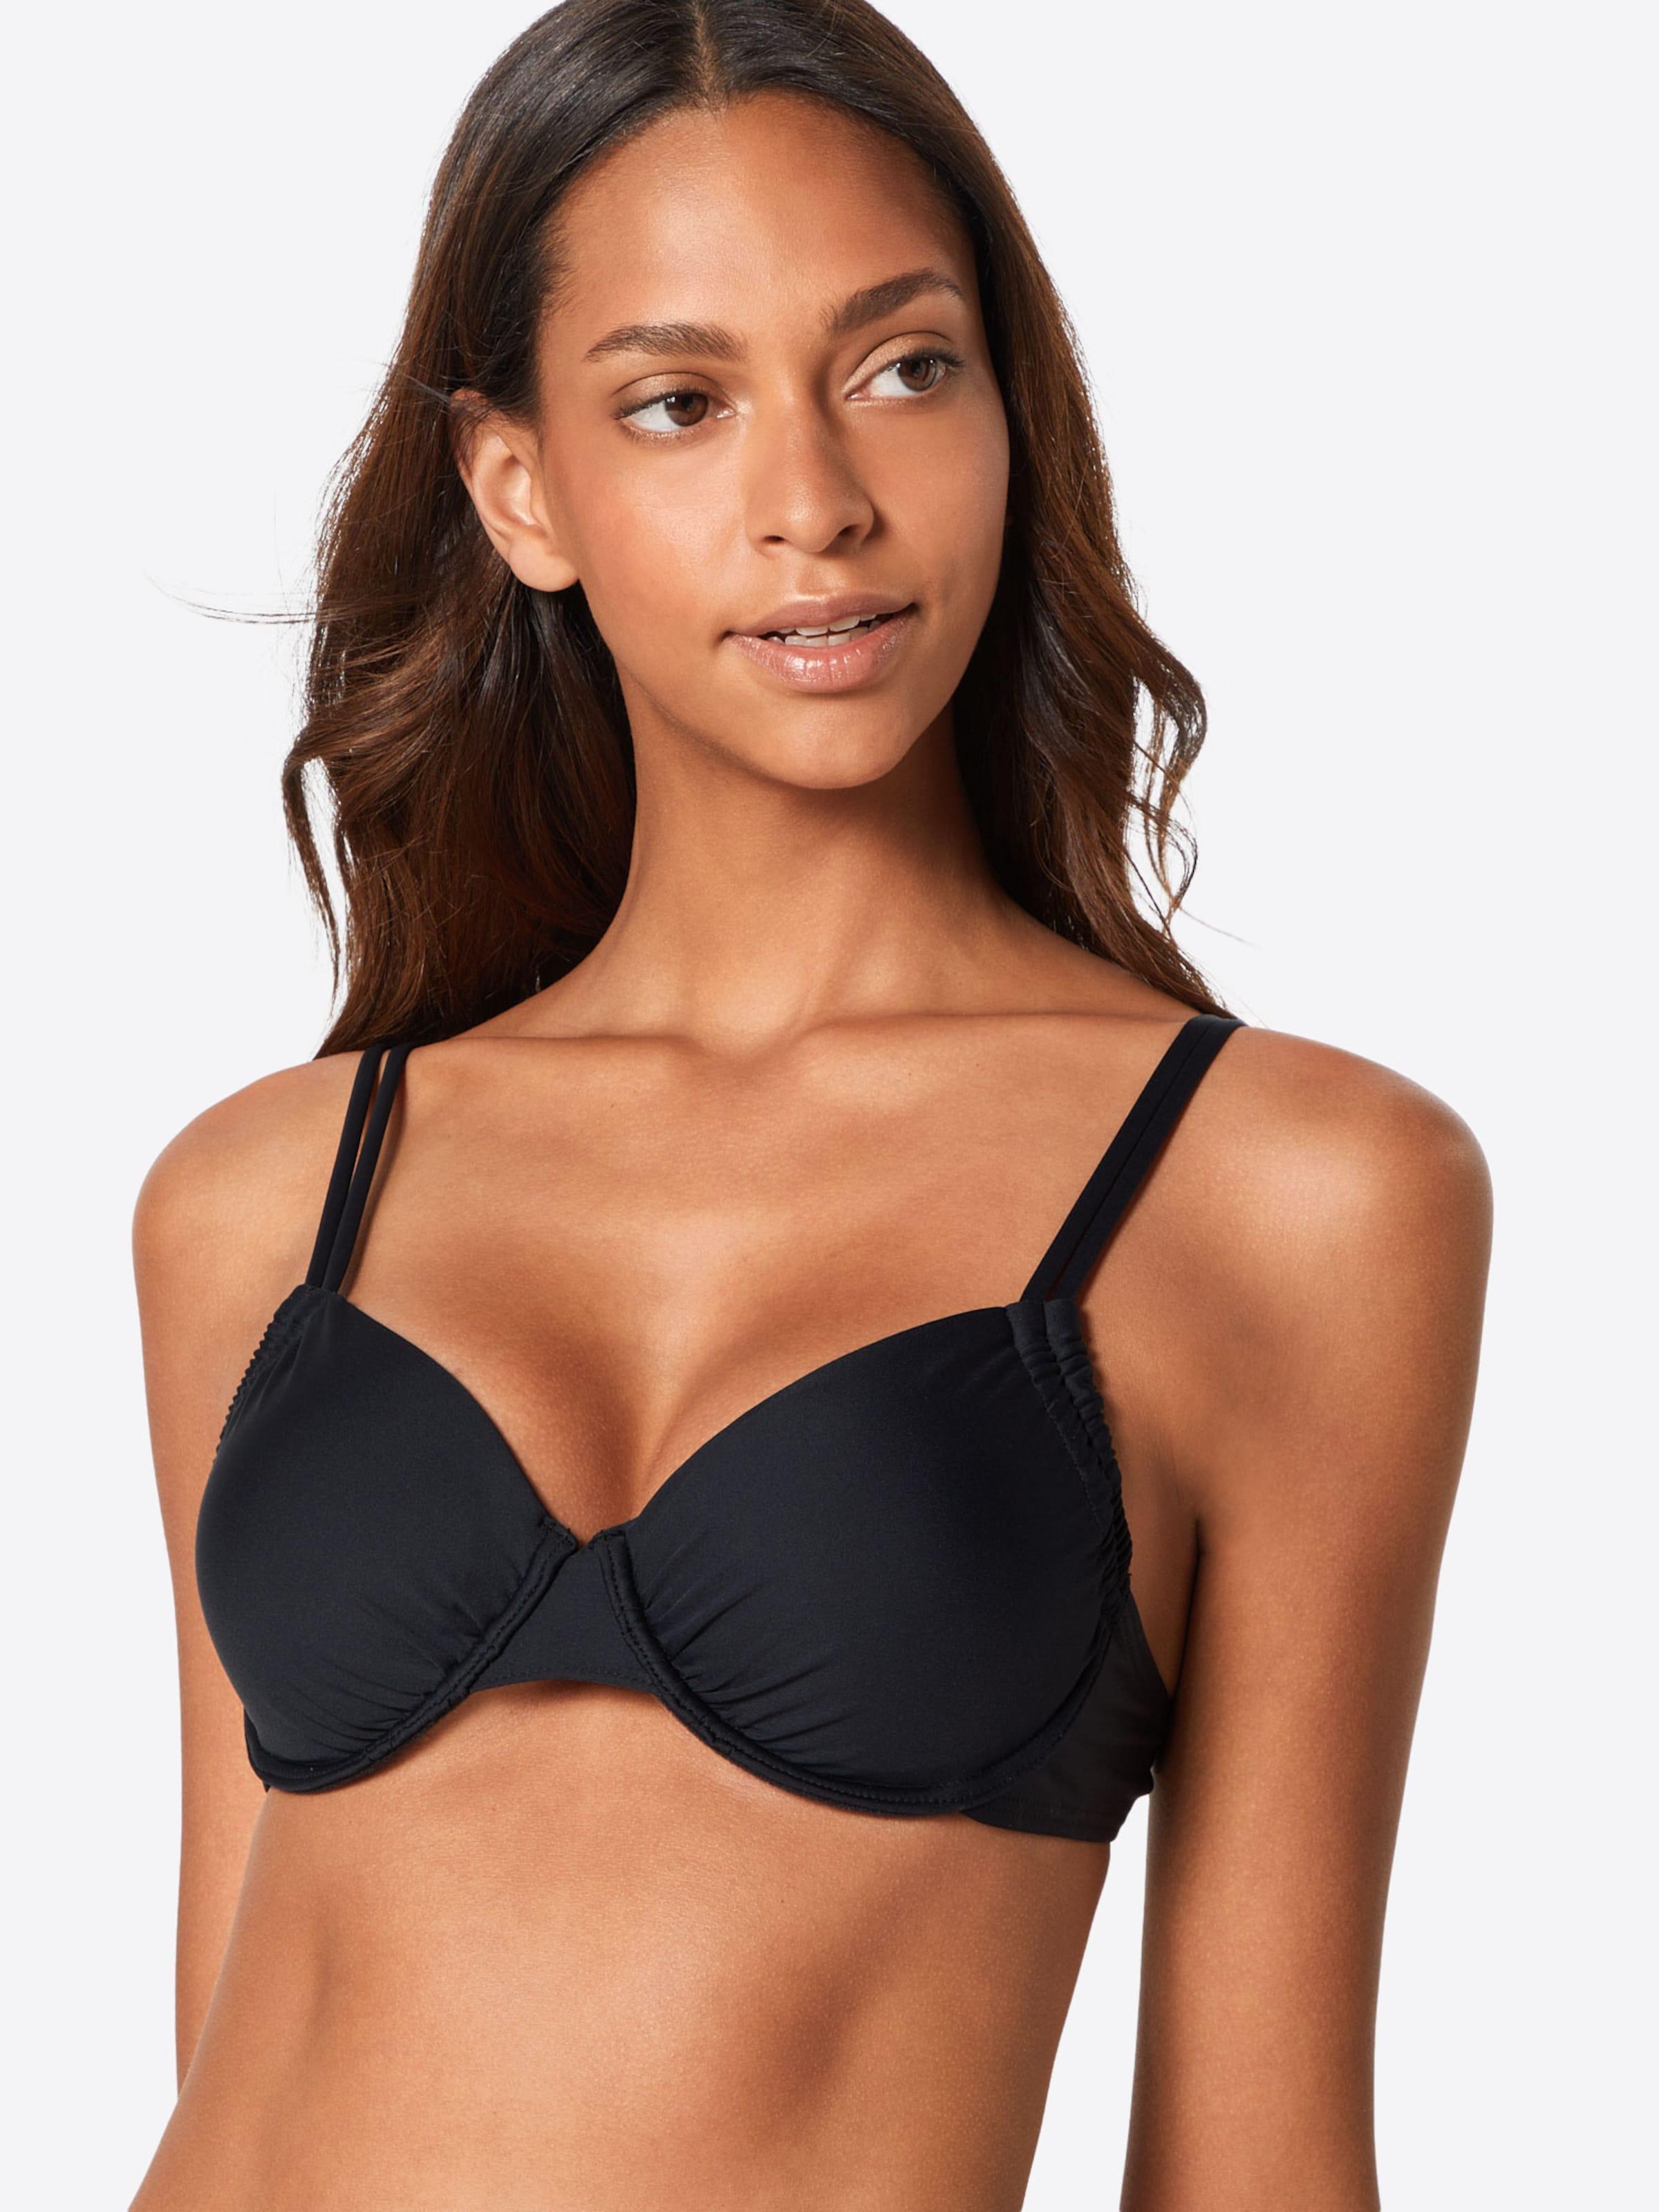 Noir En You 'marlene' Bikini About De Hauts 3R5L4Aj